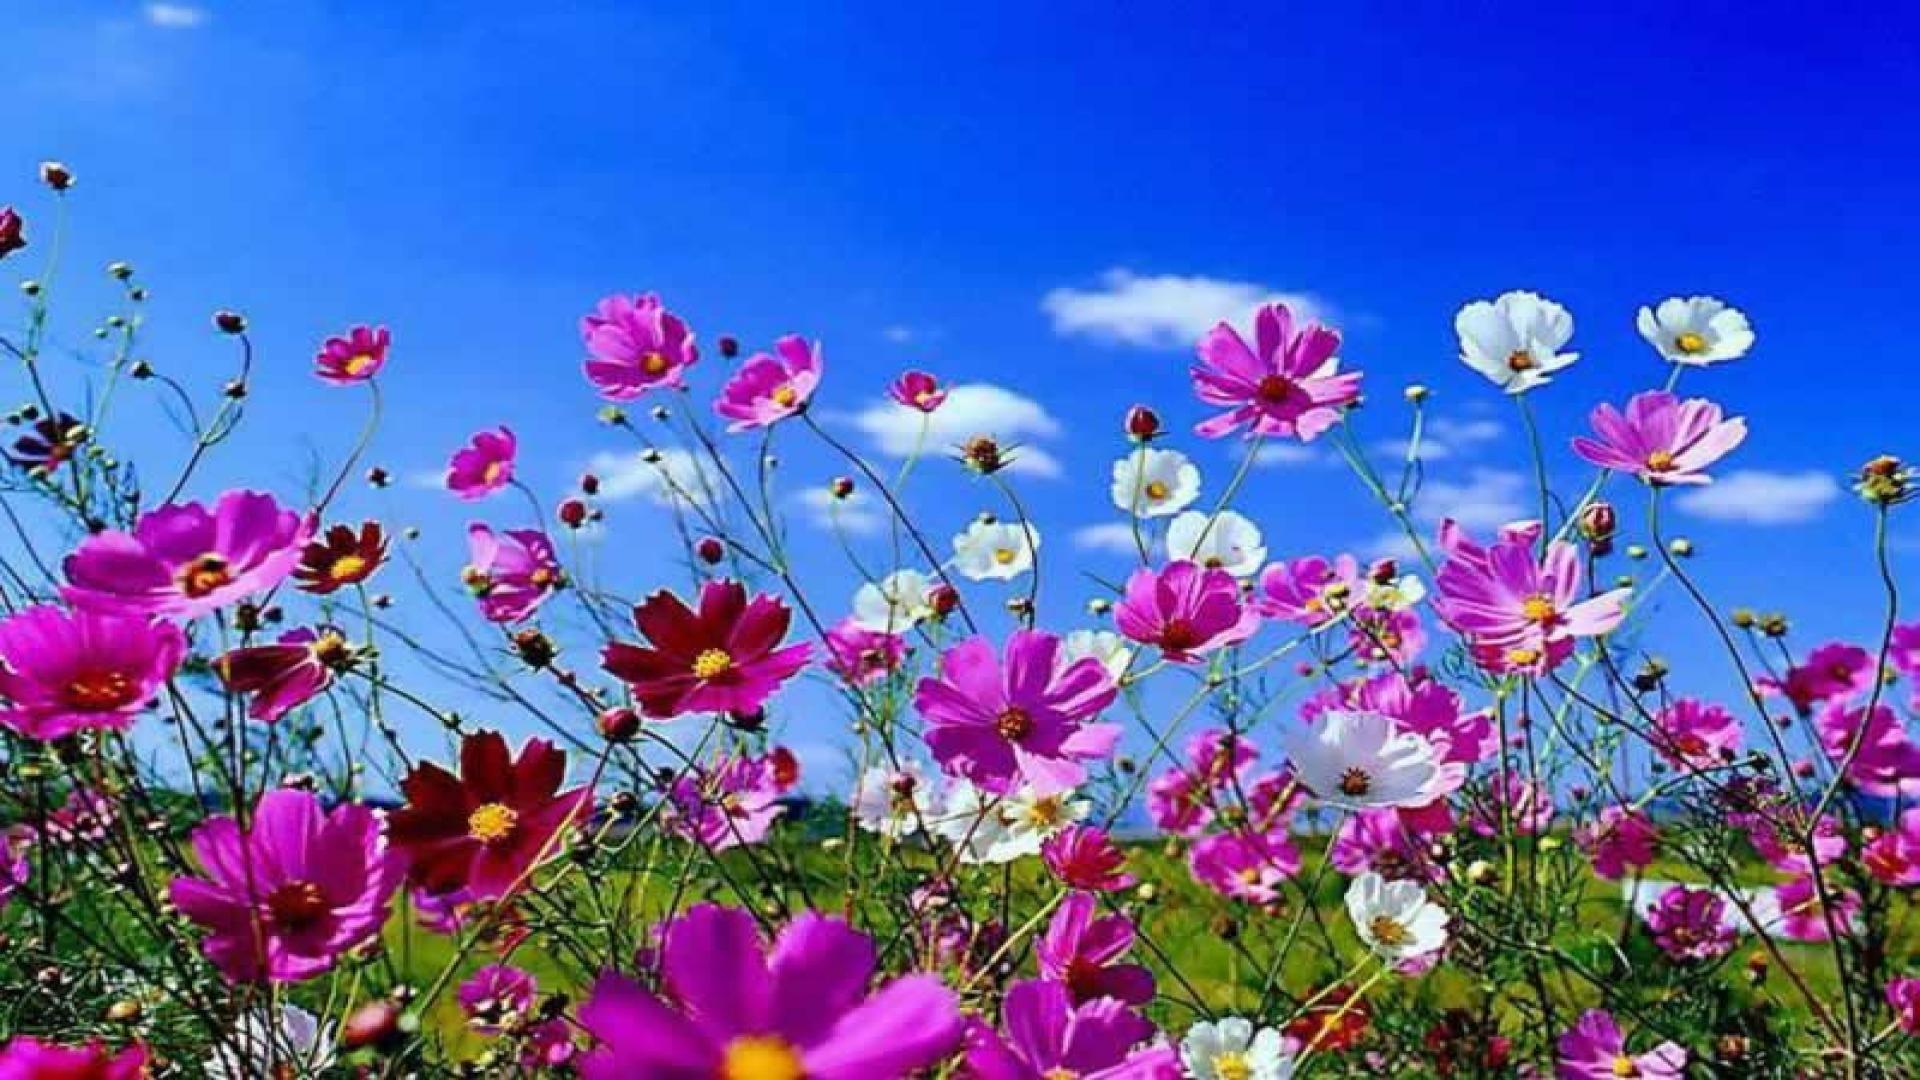 Seasonal Pictures for Desktop Wallpaper   Desktop Image